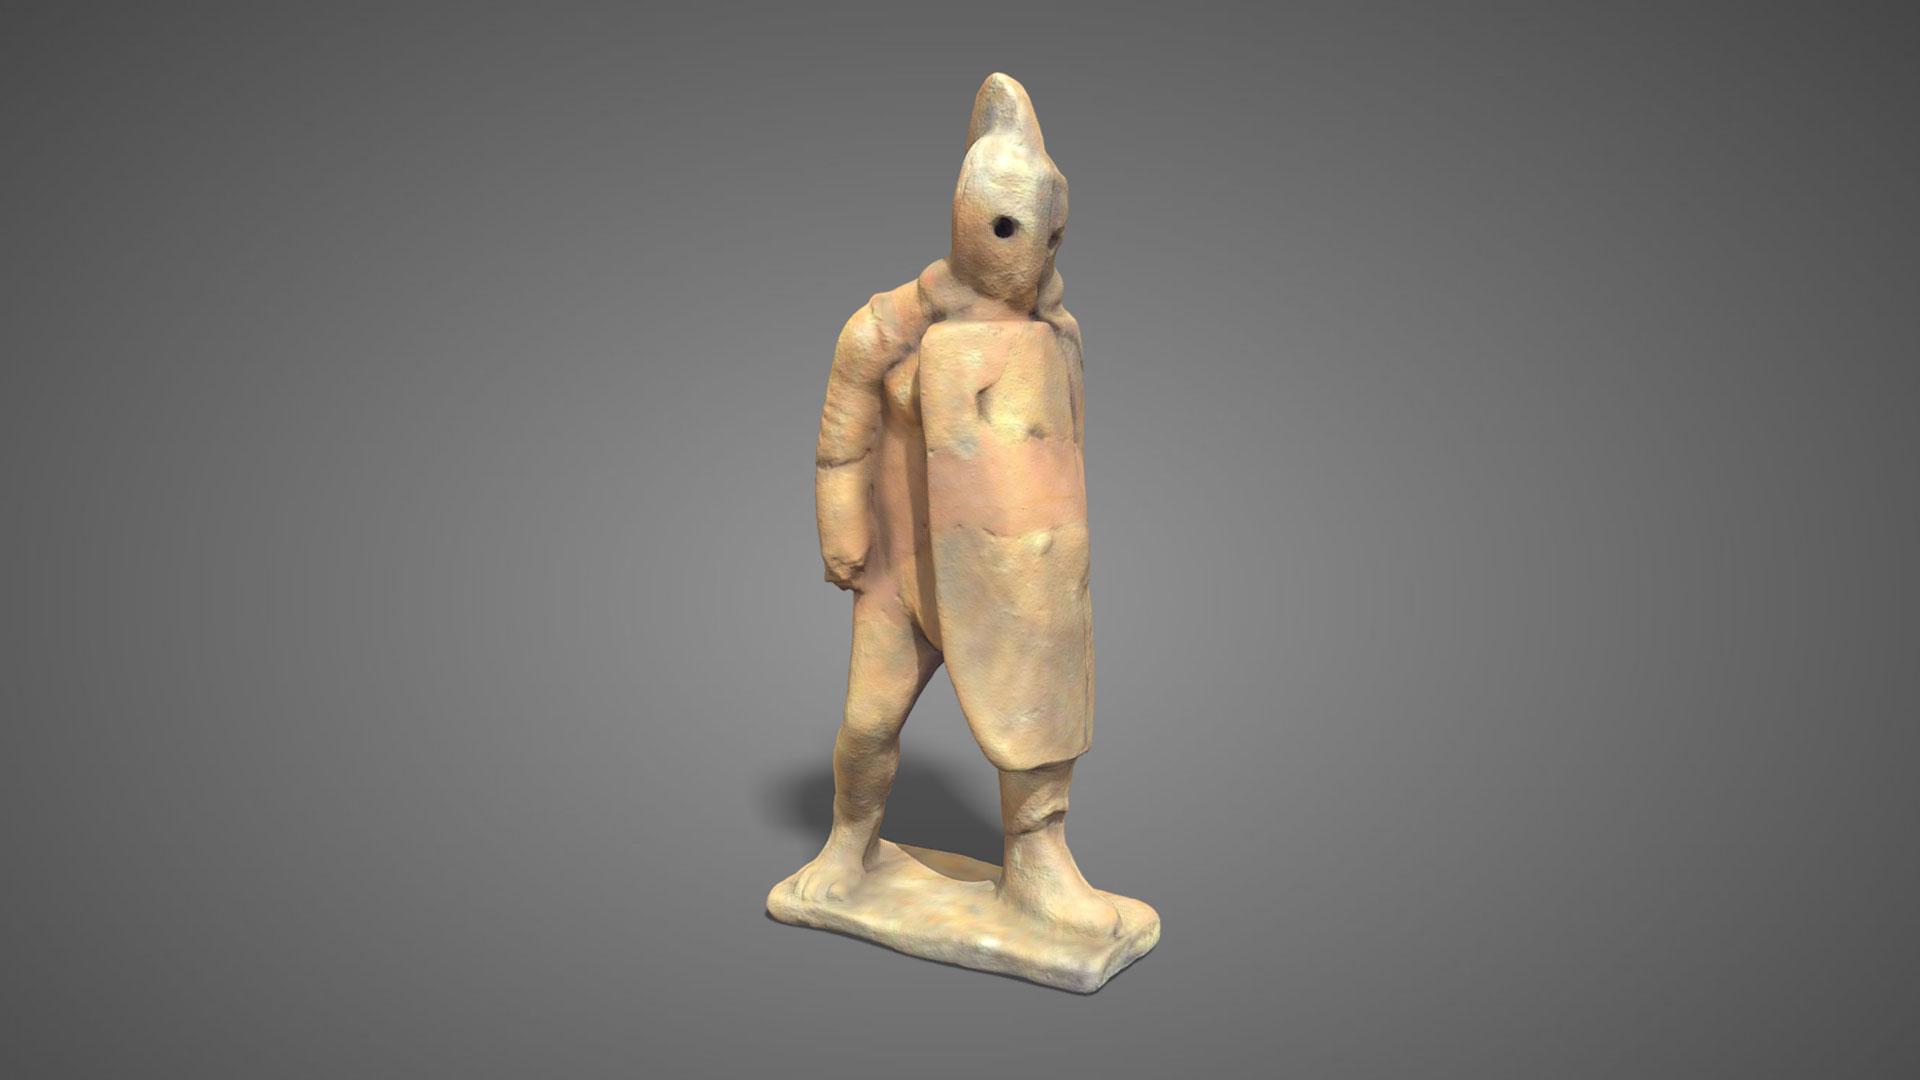 Gladiatore in terracotta | Terracotta gladiator n°2 - 3D Model